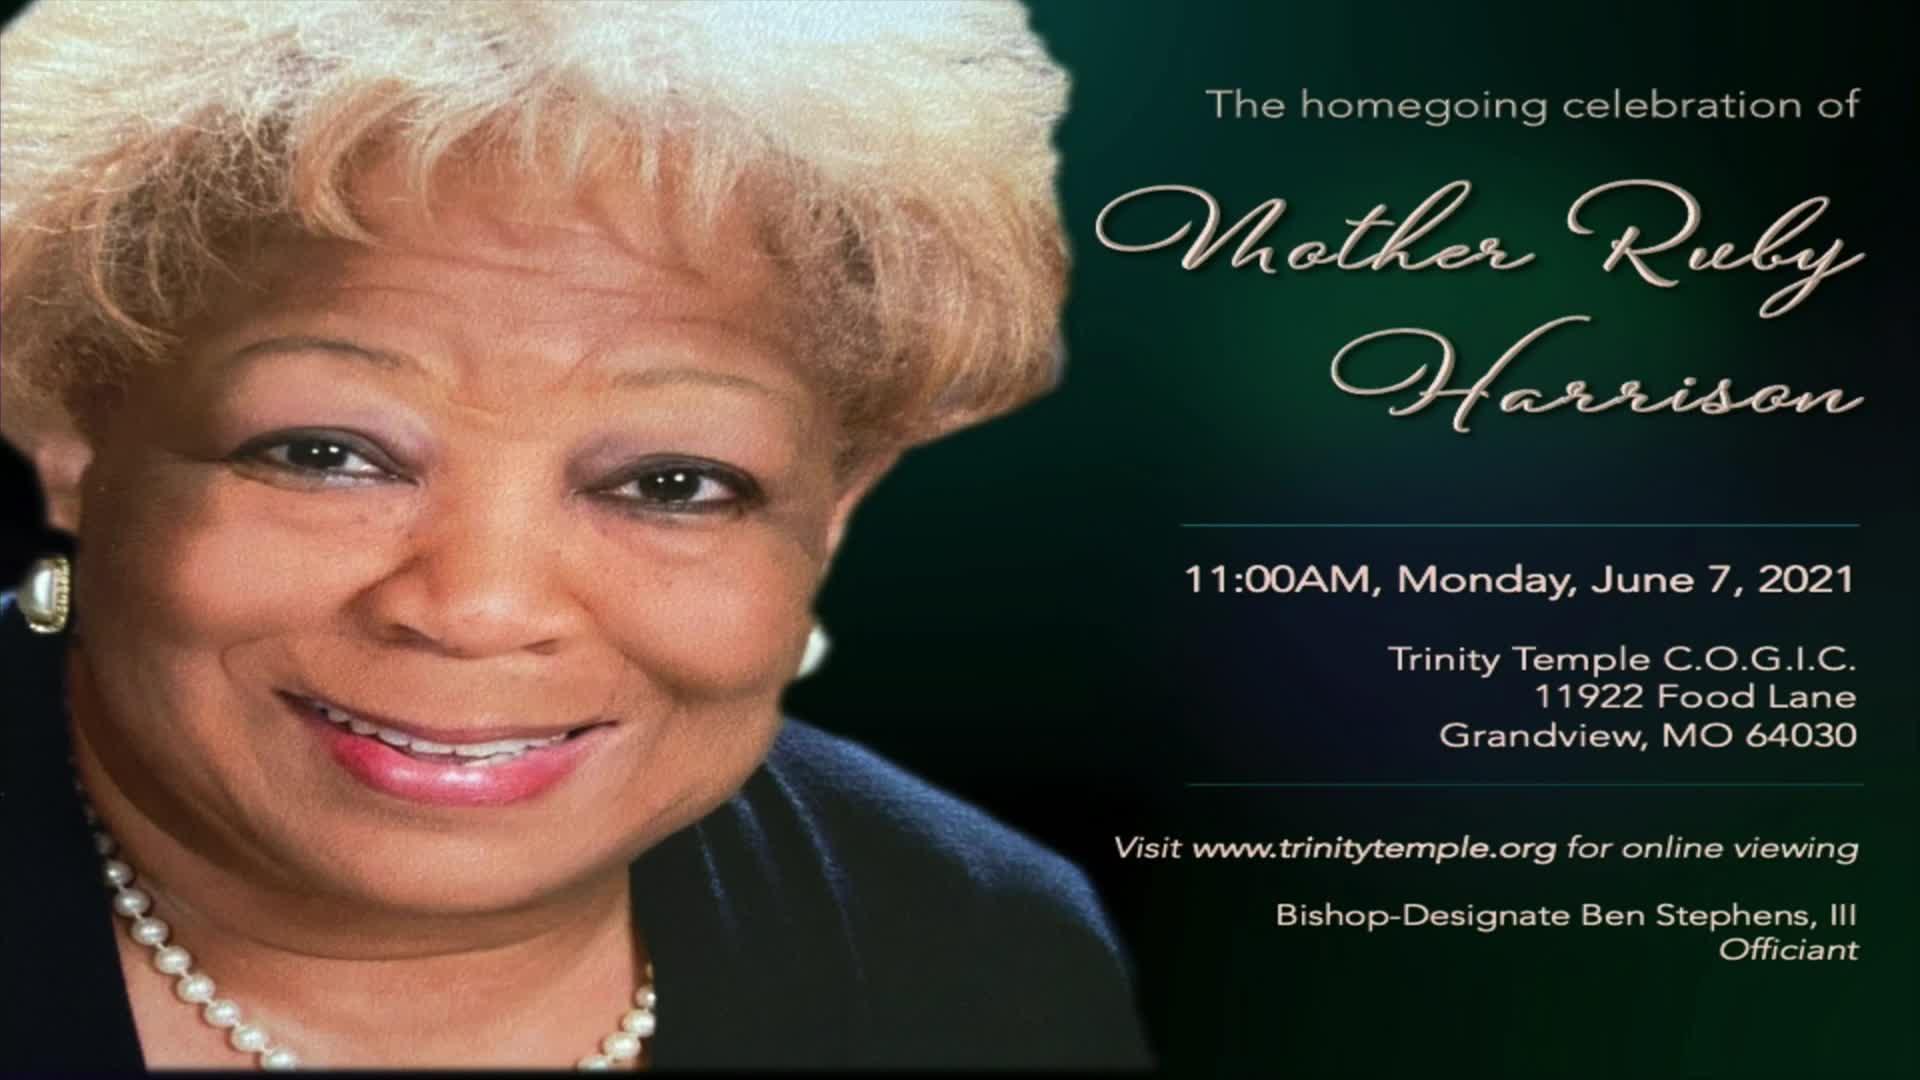 Homegoing celebration for Mother Ruby Harrison on 07-Jun-21-15:55:05